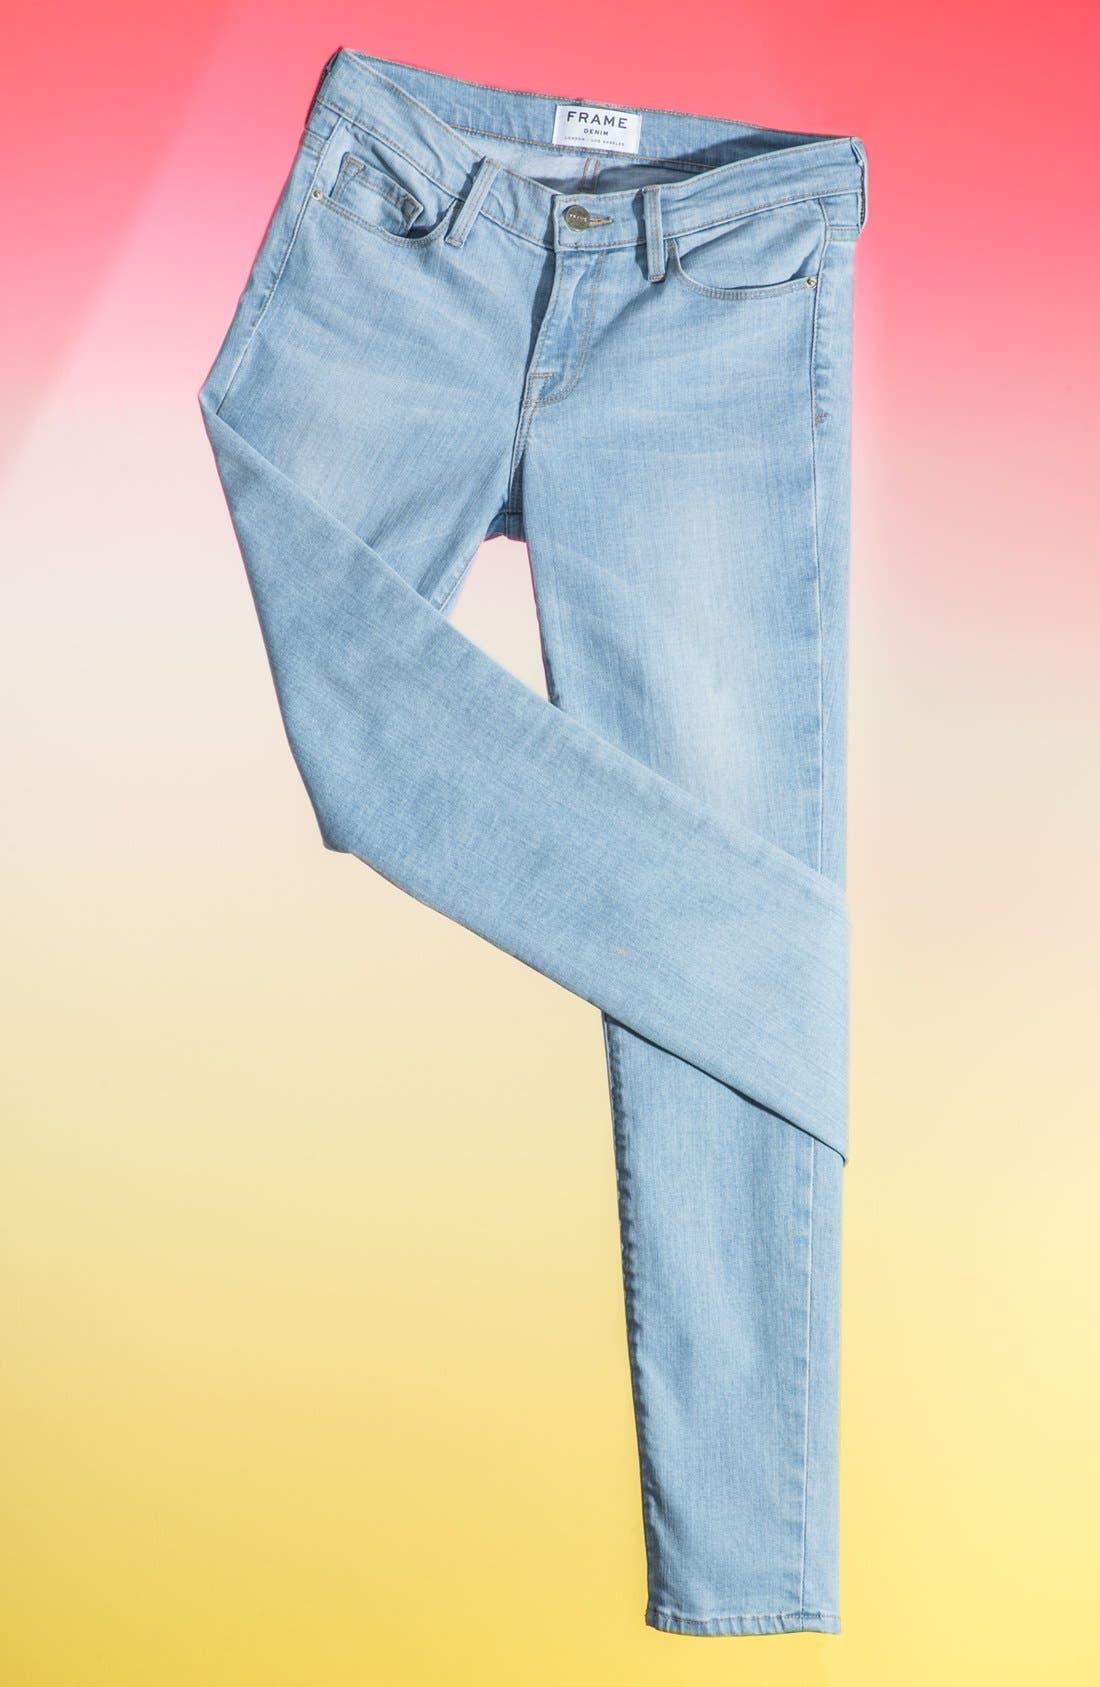 Alternate Image 1 Selected - Frame Denim 'Le Skinny de Jeanne' Jeans (Redchurch Street)